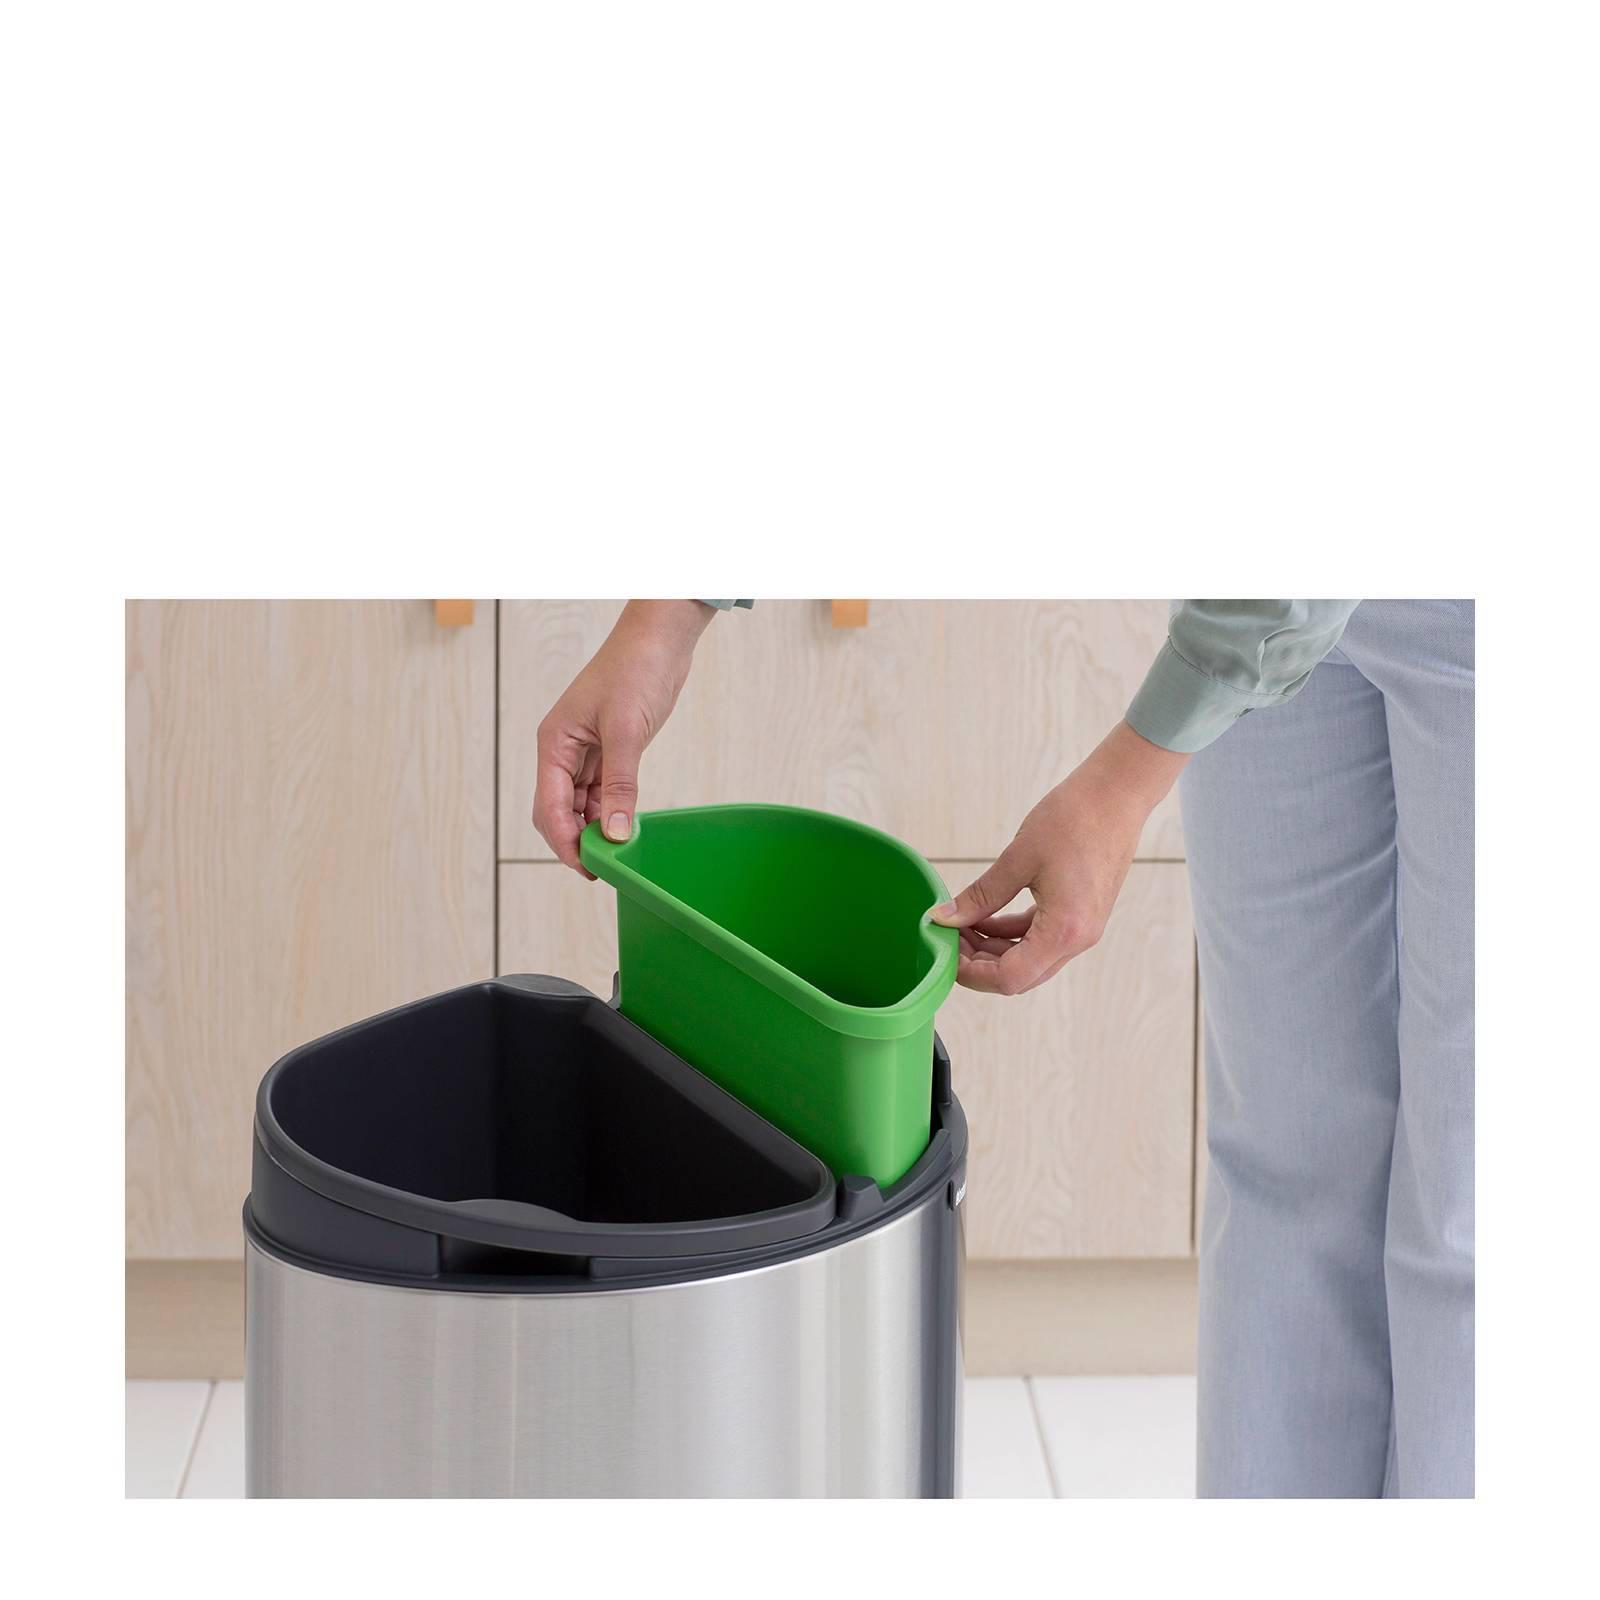 Brabantia Touch Bin Rvs.Brabantia Touch Bin Recycle Prullenbak 23 10 Liter Wehkamp